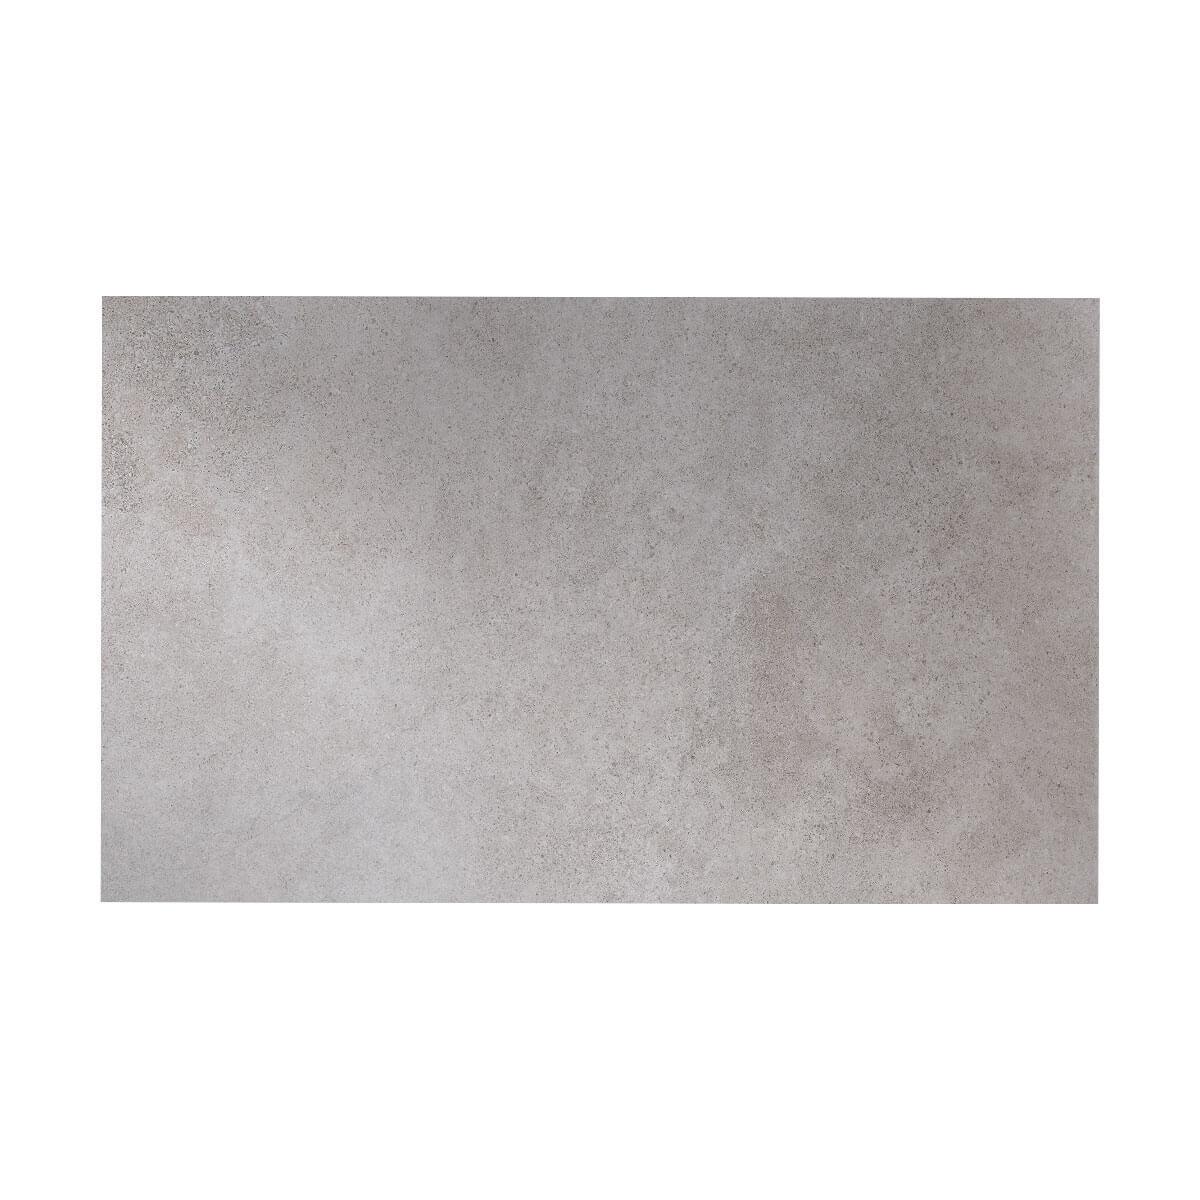 Buy seaton tiles online british ceramic tile dark grey stone wall floor british ceramic tile seaton doublecrazyfo Gallery